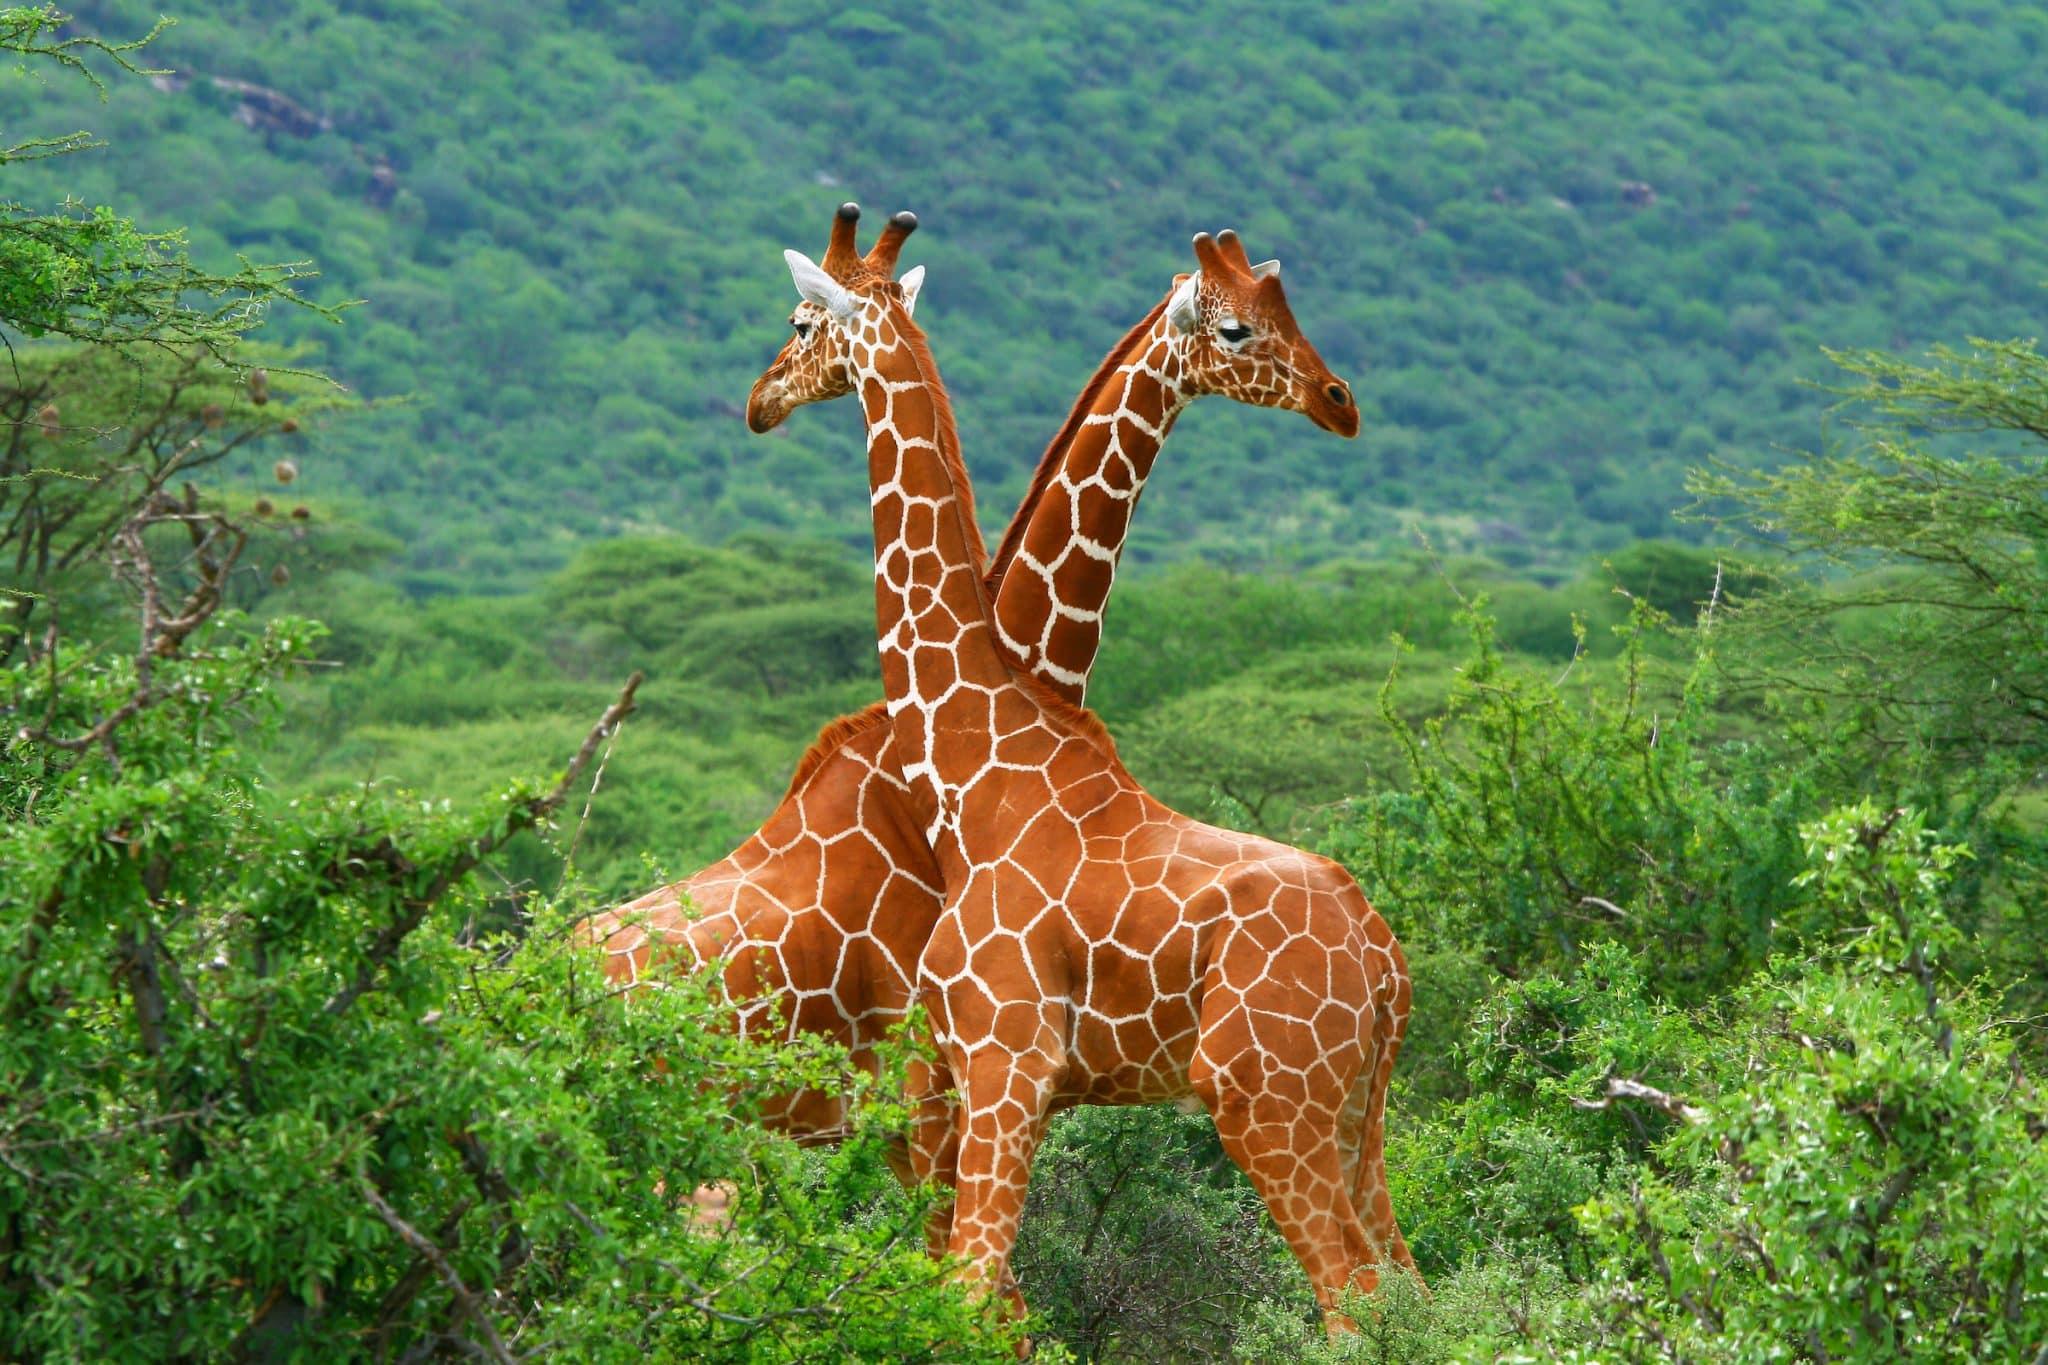 Fight of two giraffes. Africa. Kenya. Samburu national park.